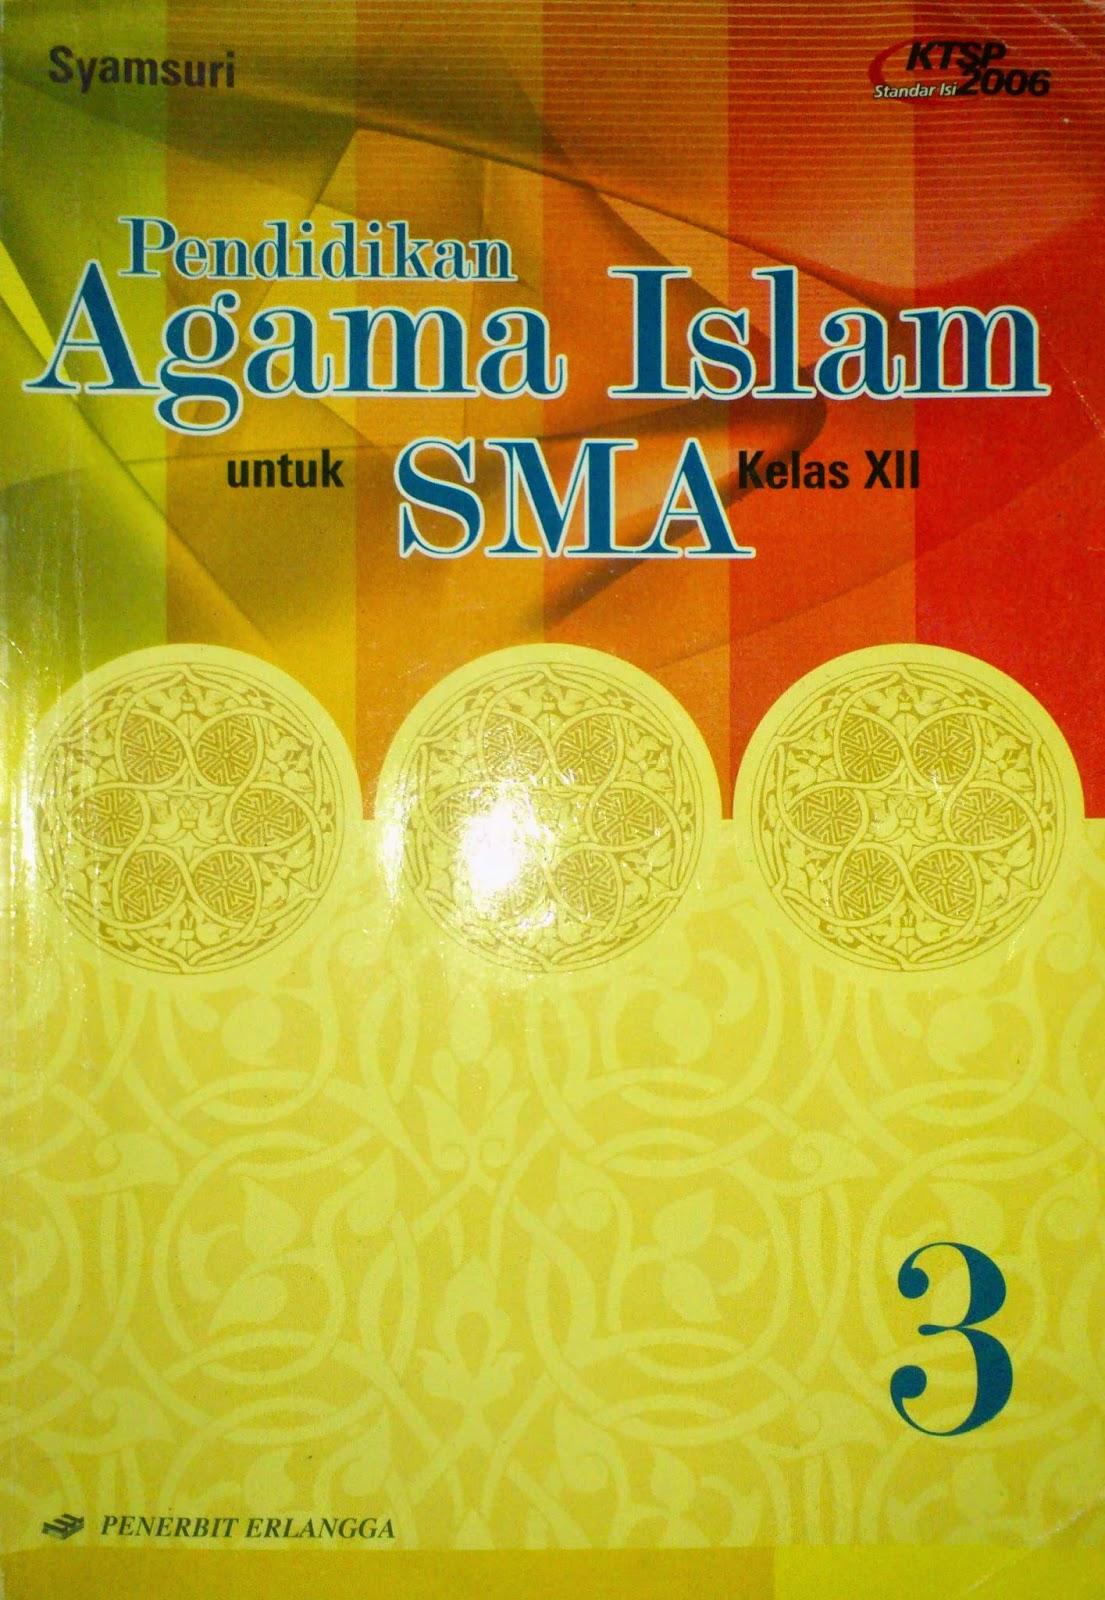 Analisis Buku  Pendidikan Agama Islam Untuk Kelas XII SMA